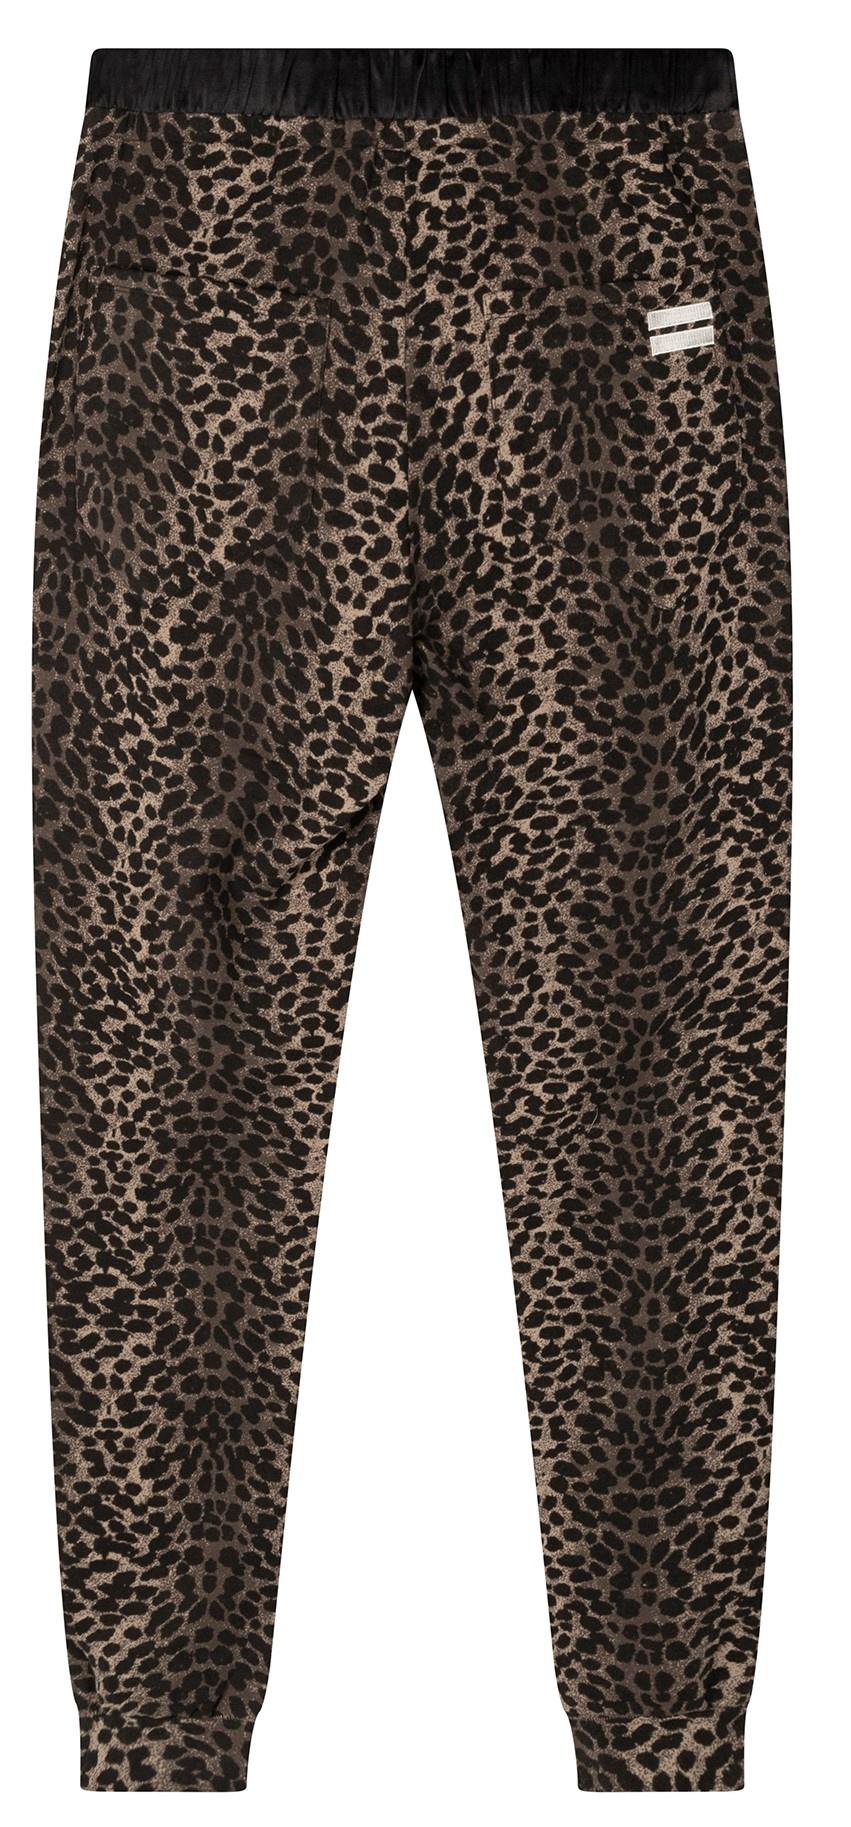 Broek jogger leopard camo desert taupe-5